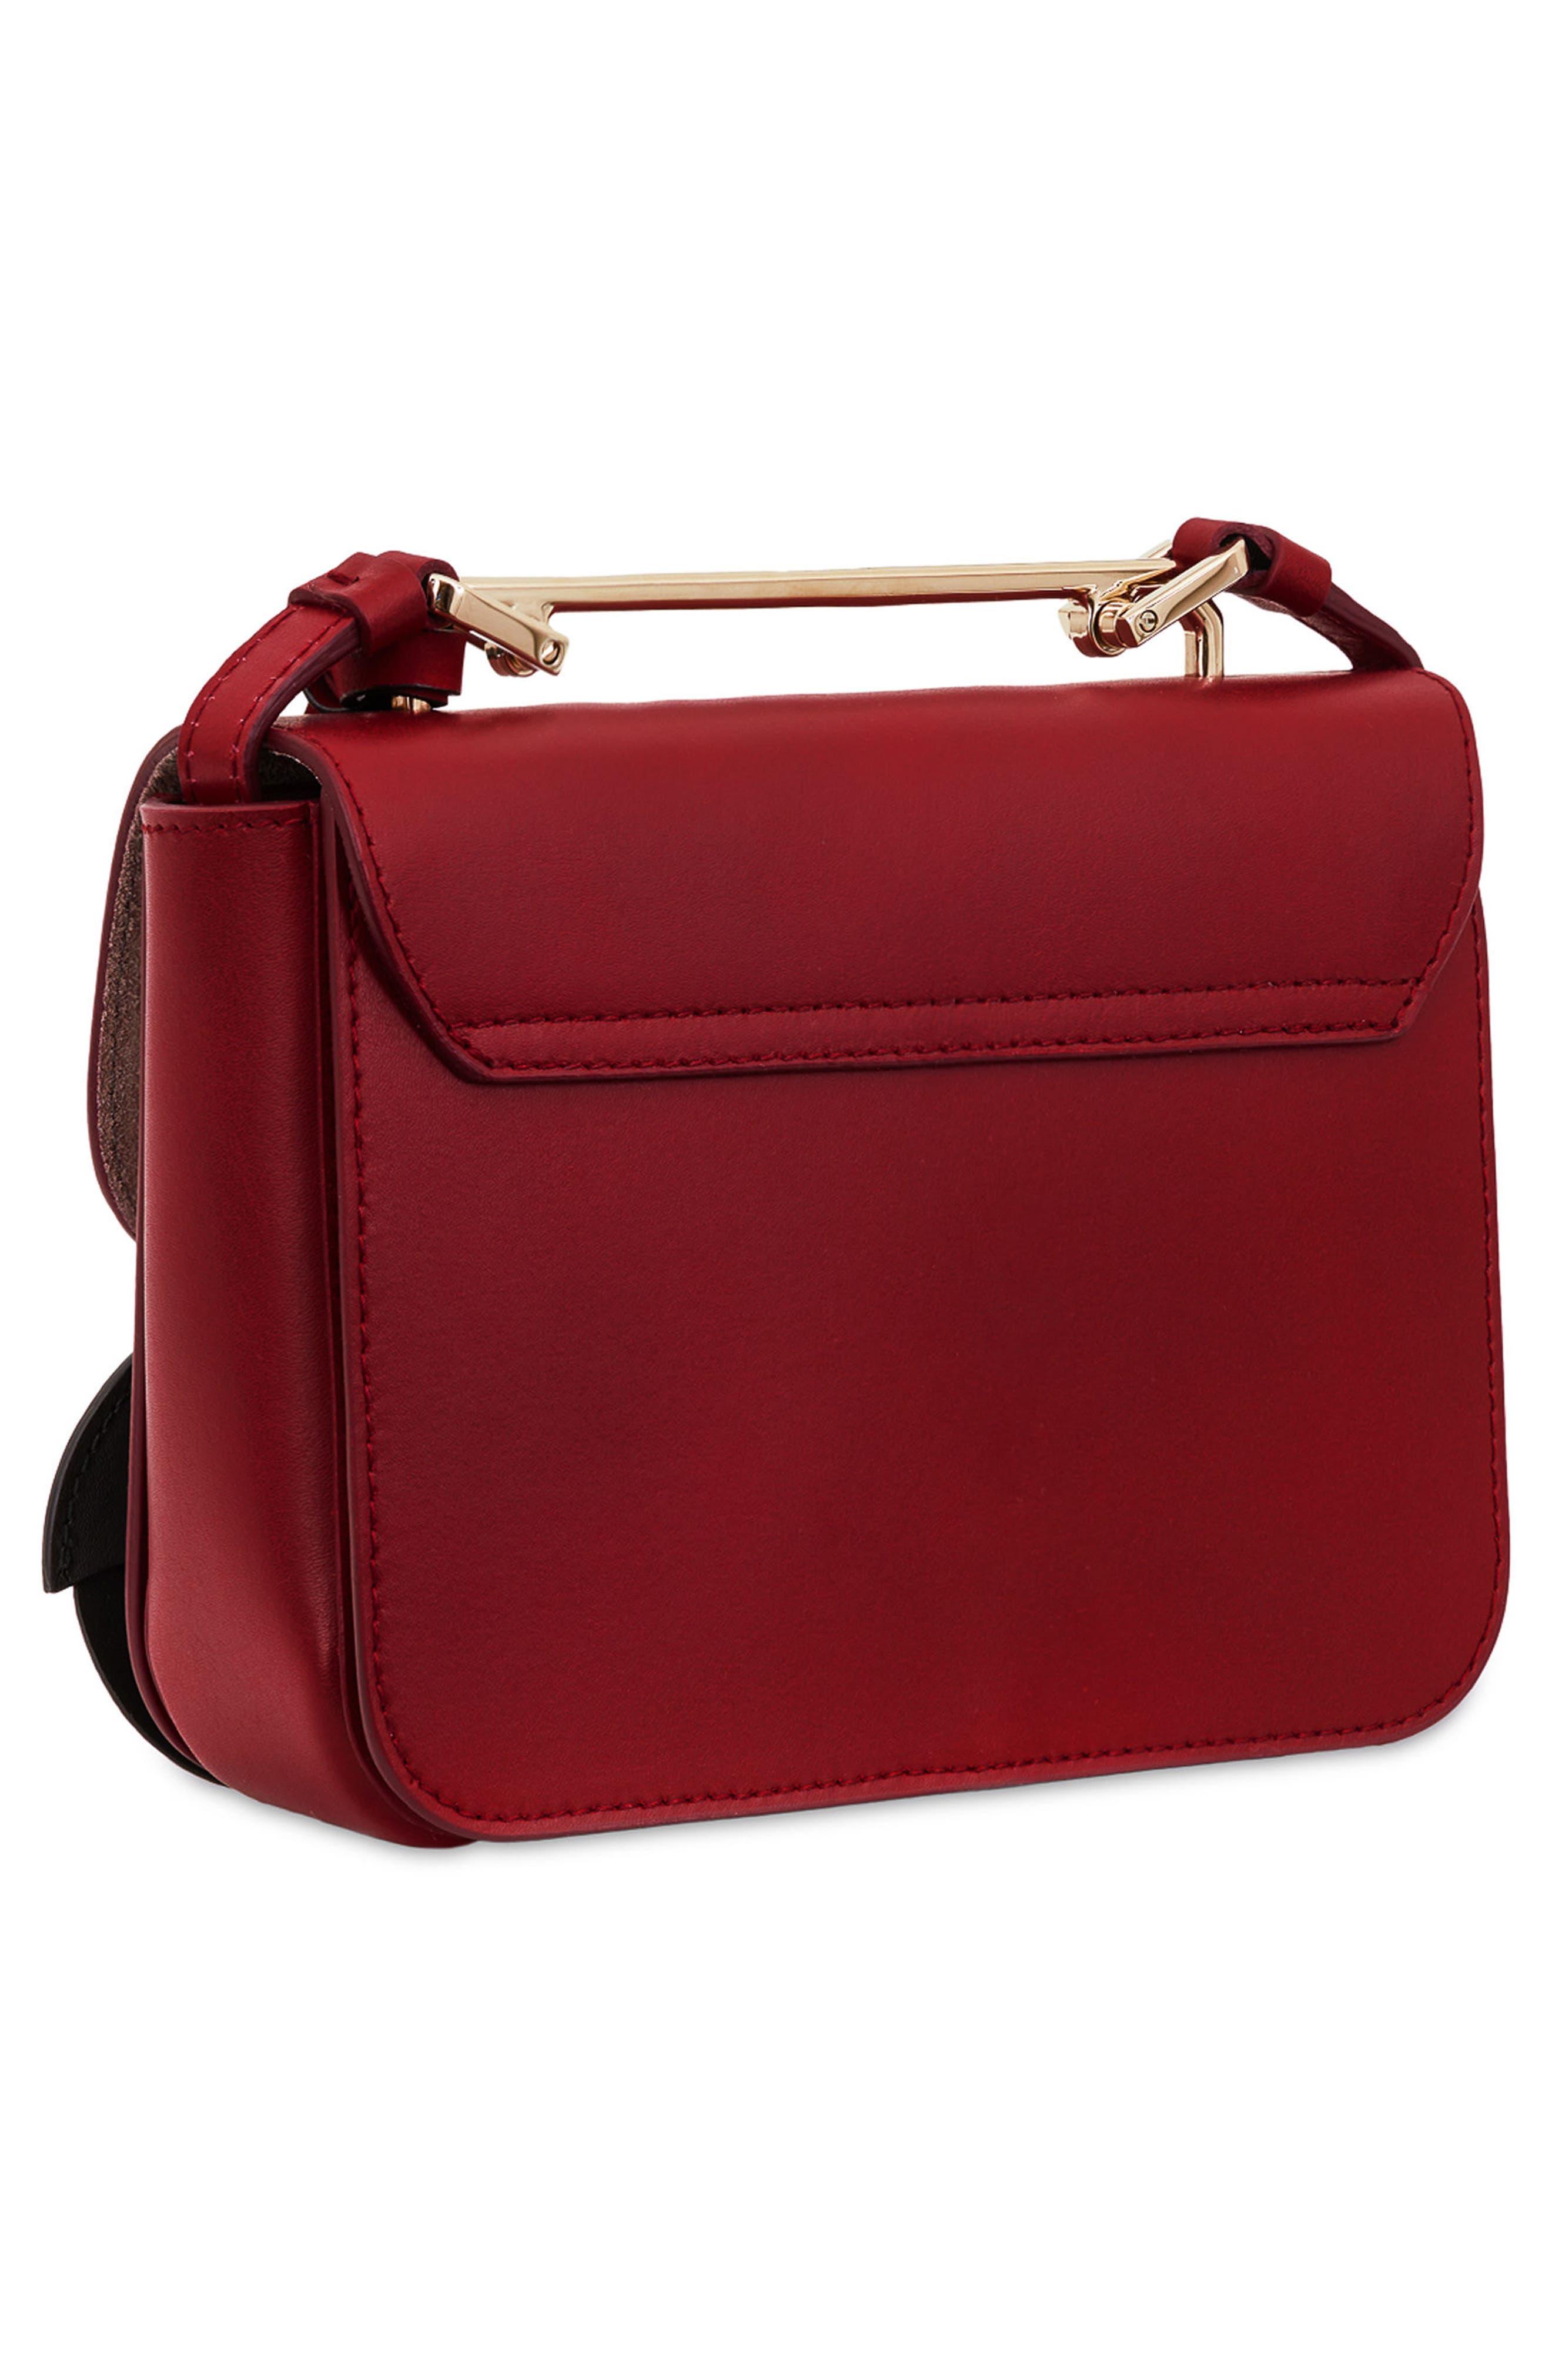 Elisir Mini Crossbody Bag,                             Alternate thumbnail 2, color,                             Ciliegia